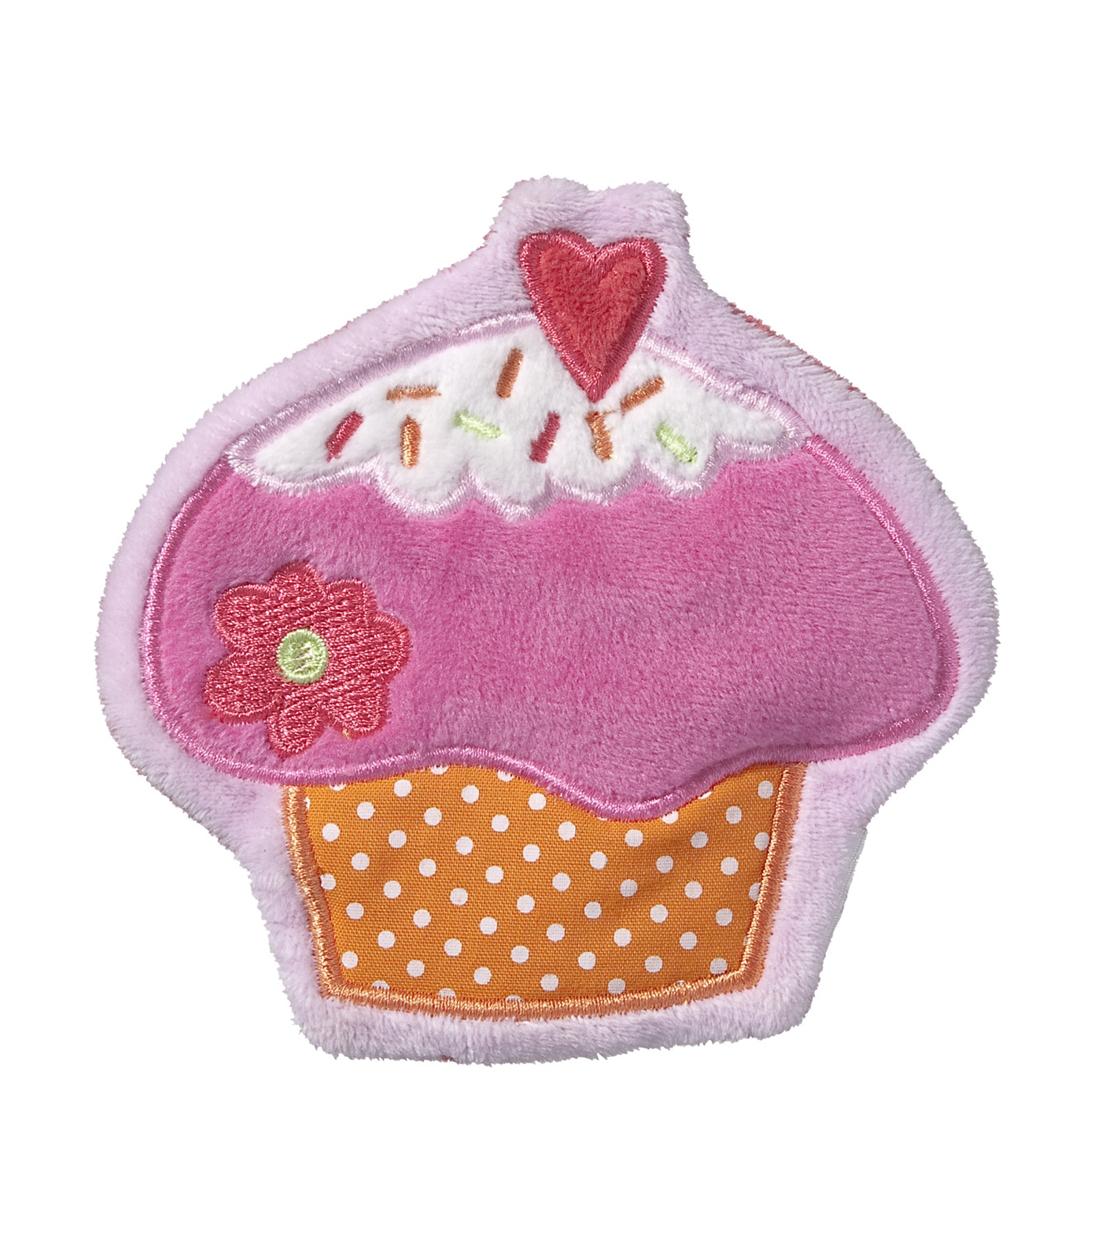 jouet crissant cupcake Hema